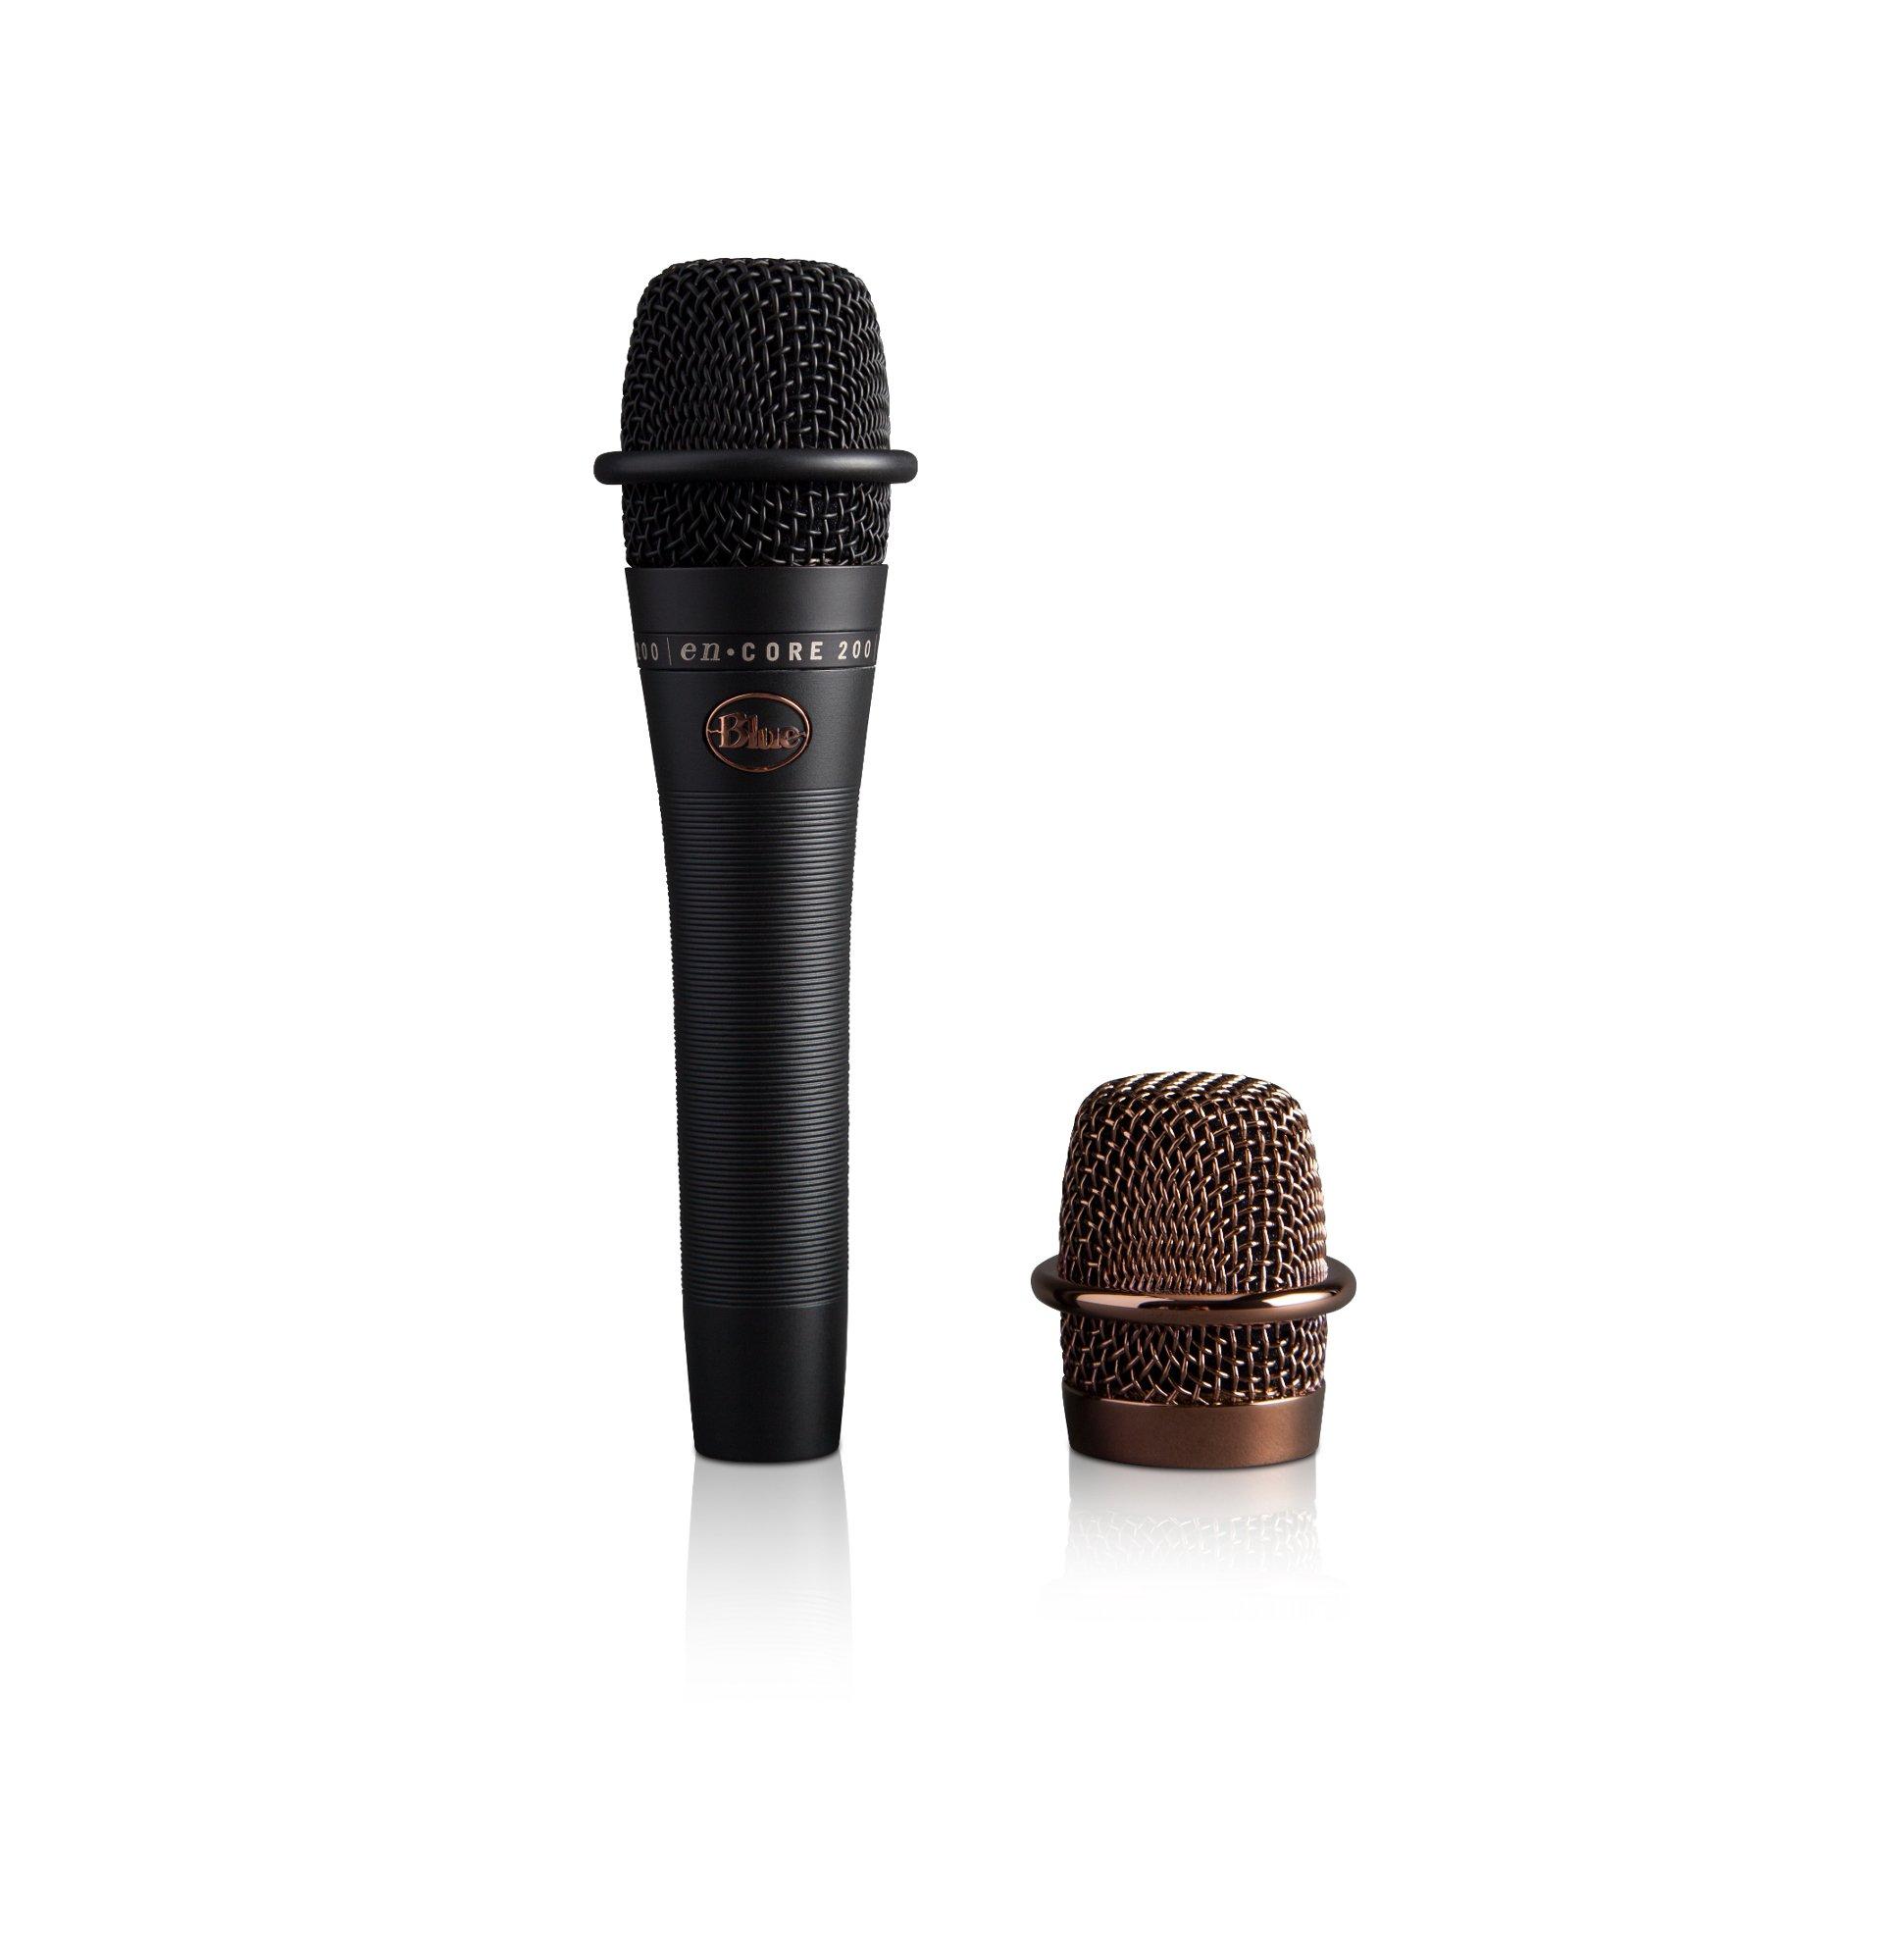 Phantom Powered Dynamic Handheld Live Performance Microphone